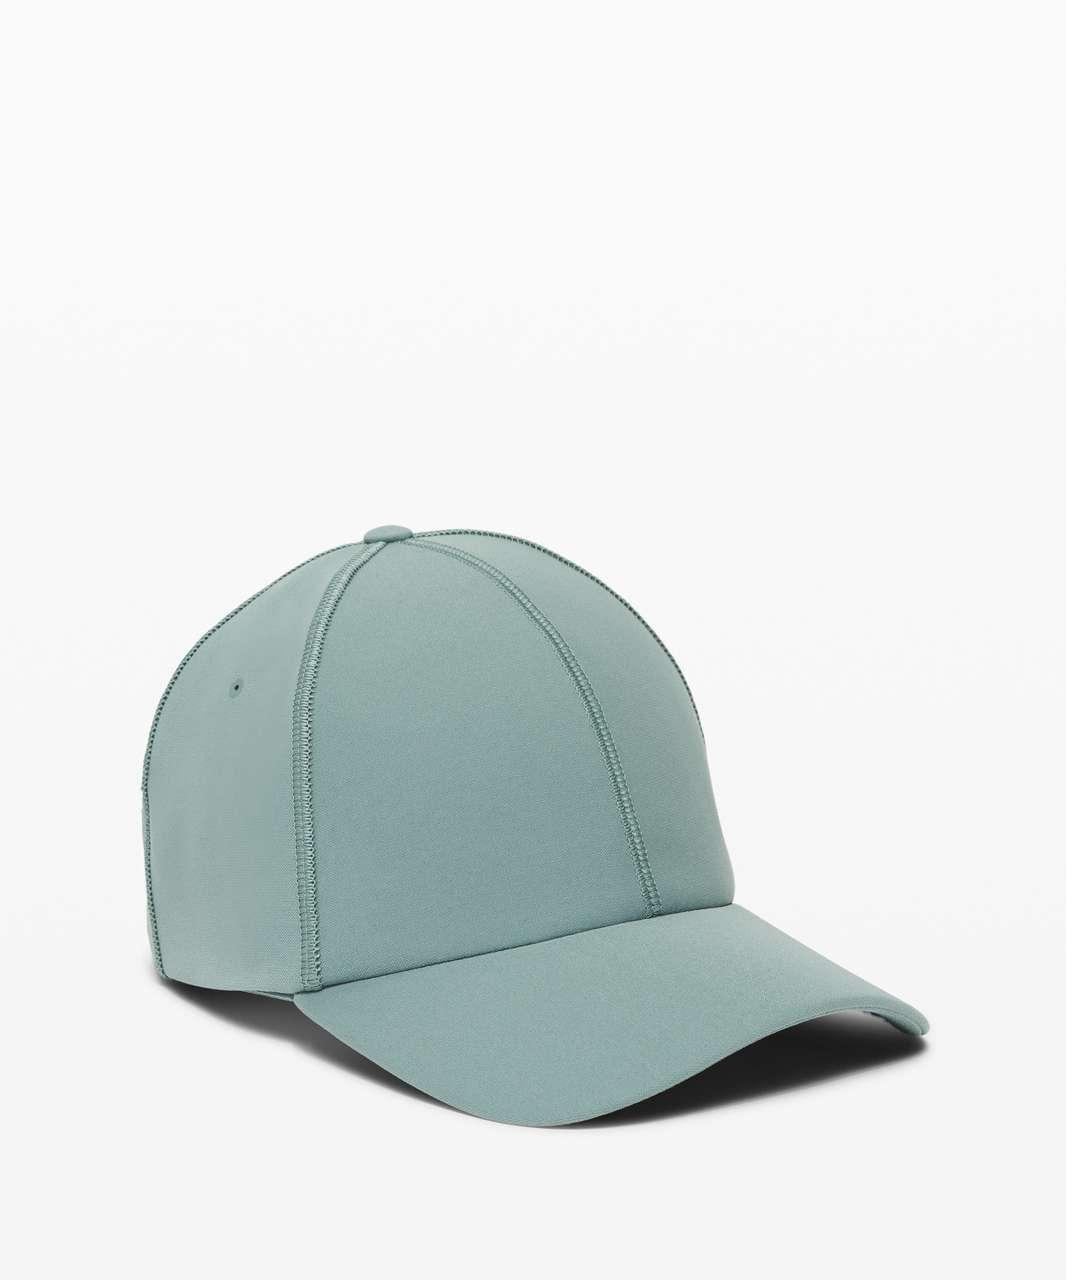 Lululemon Baller Hat - Tidewater Teal